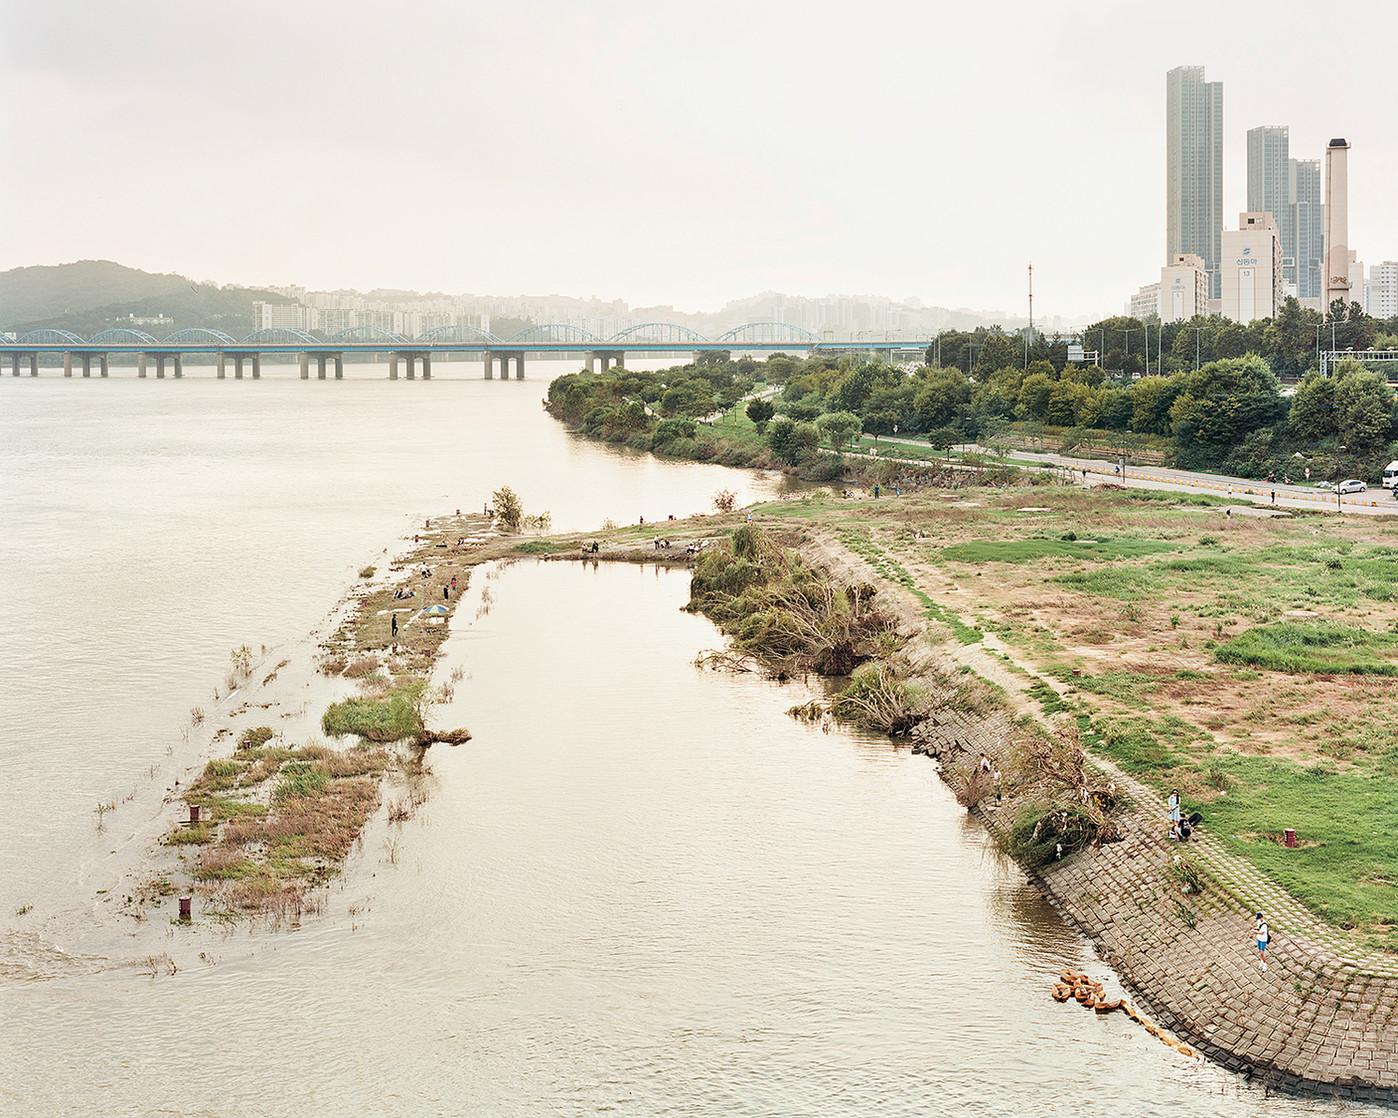 Fishing Area, Seoul, August 2020